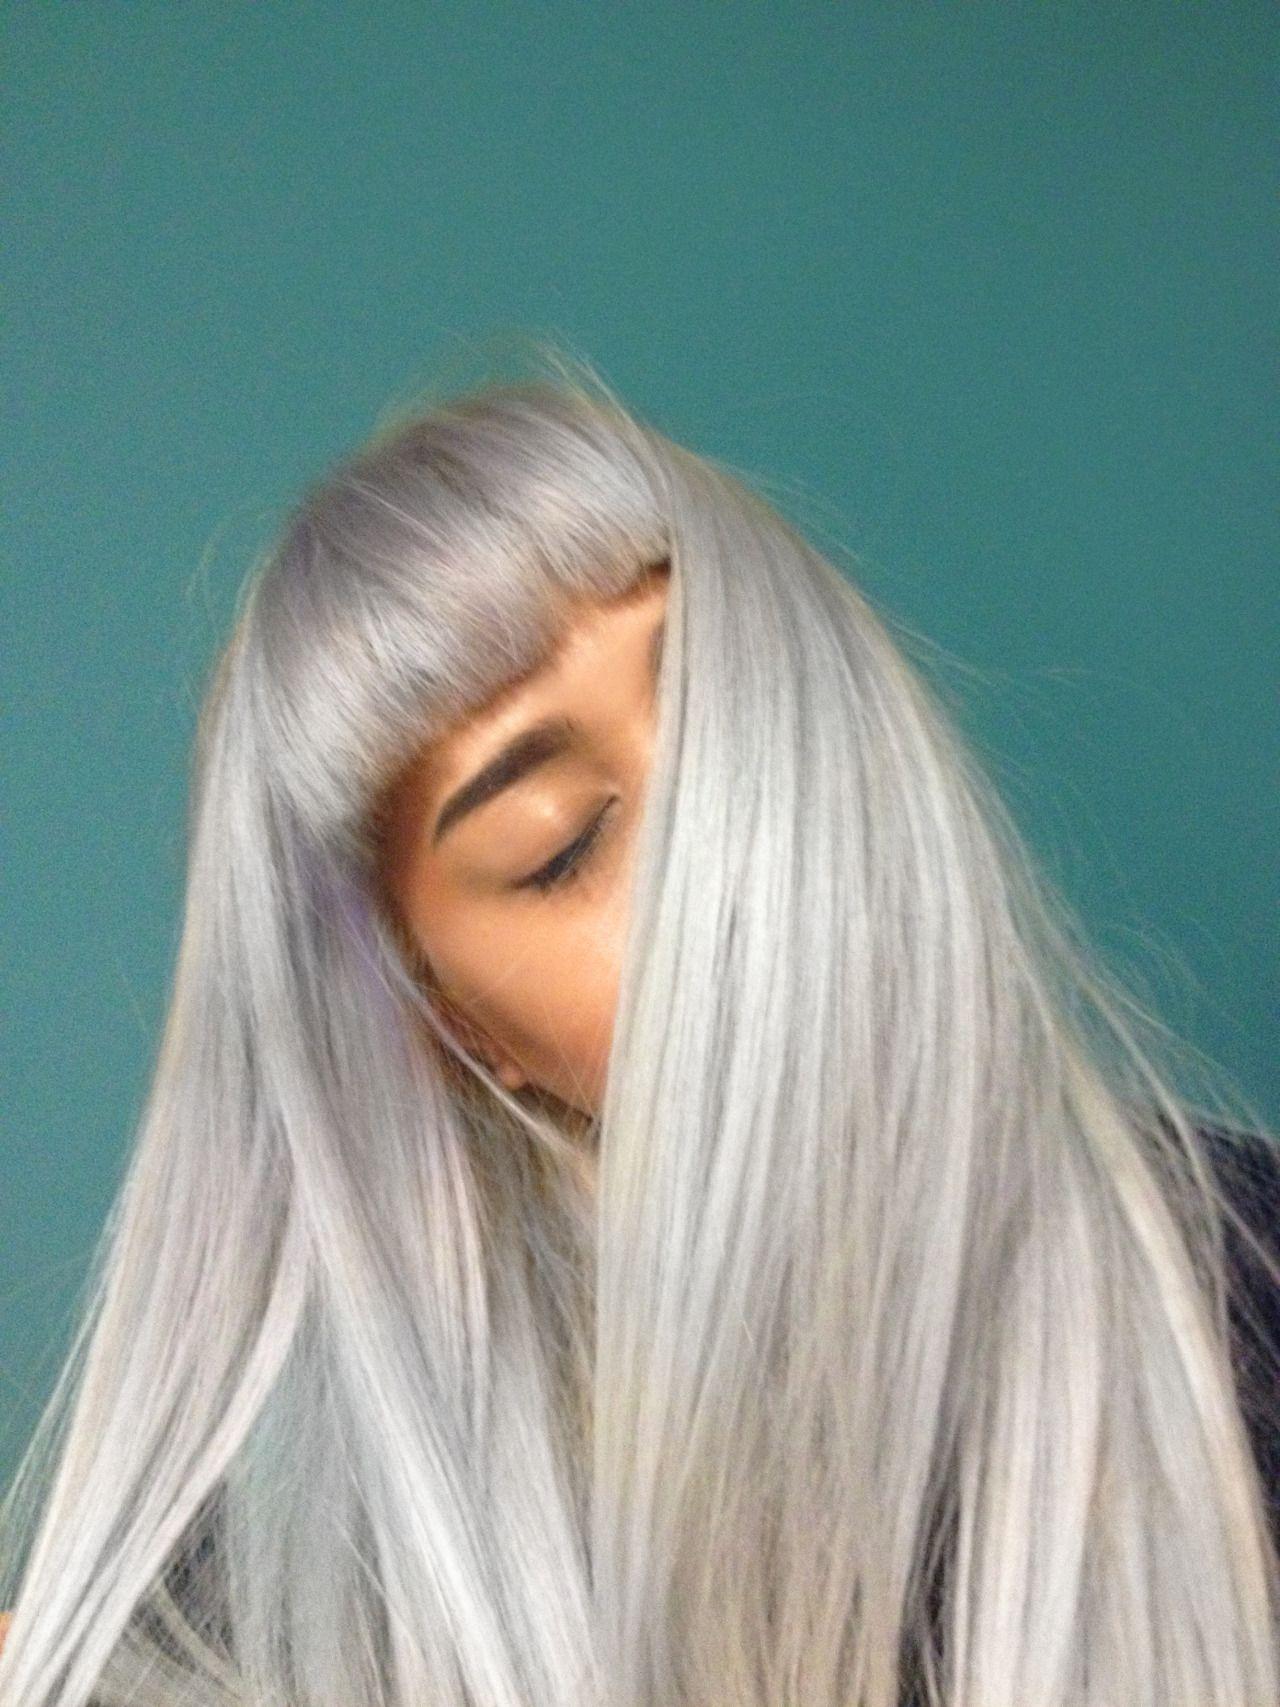 En voyageu coolt men så långt bort pinterest silver hair hair